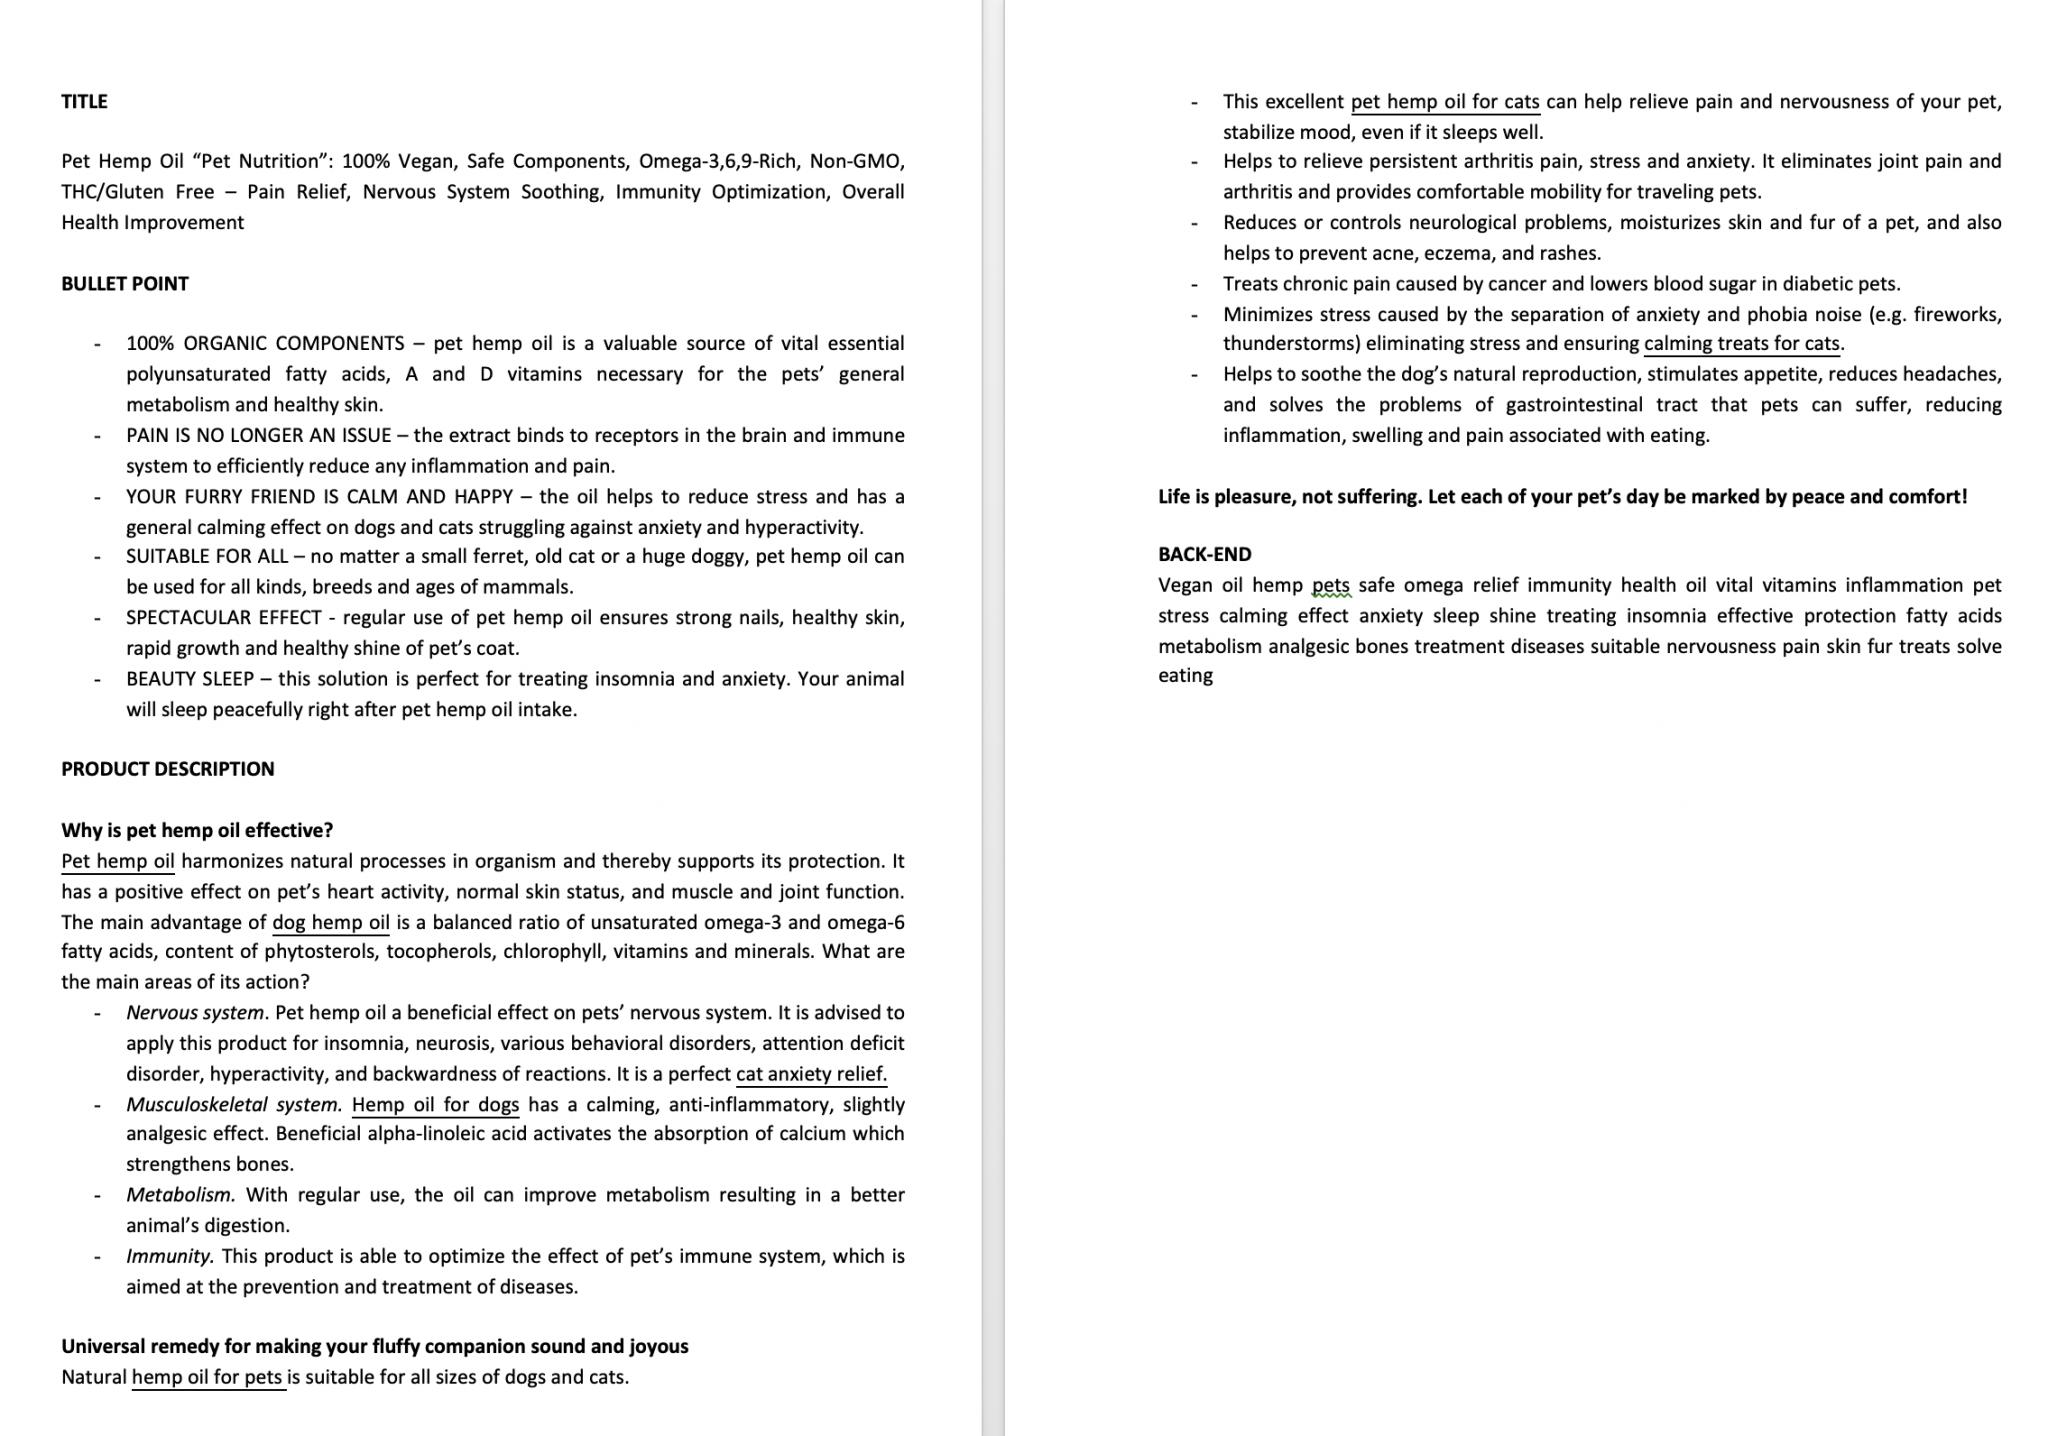 Пример текста на английском №43 – Написание текста на английском языке для листинга на Amazon.